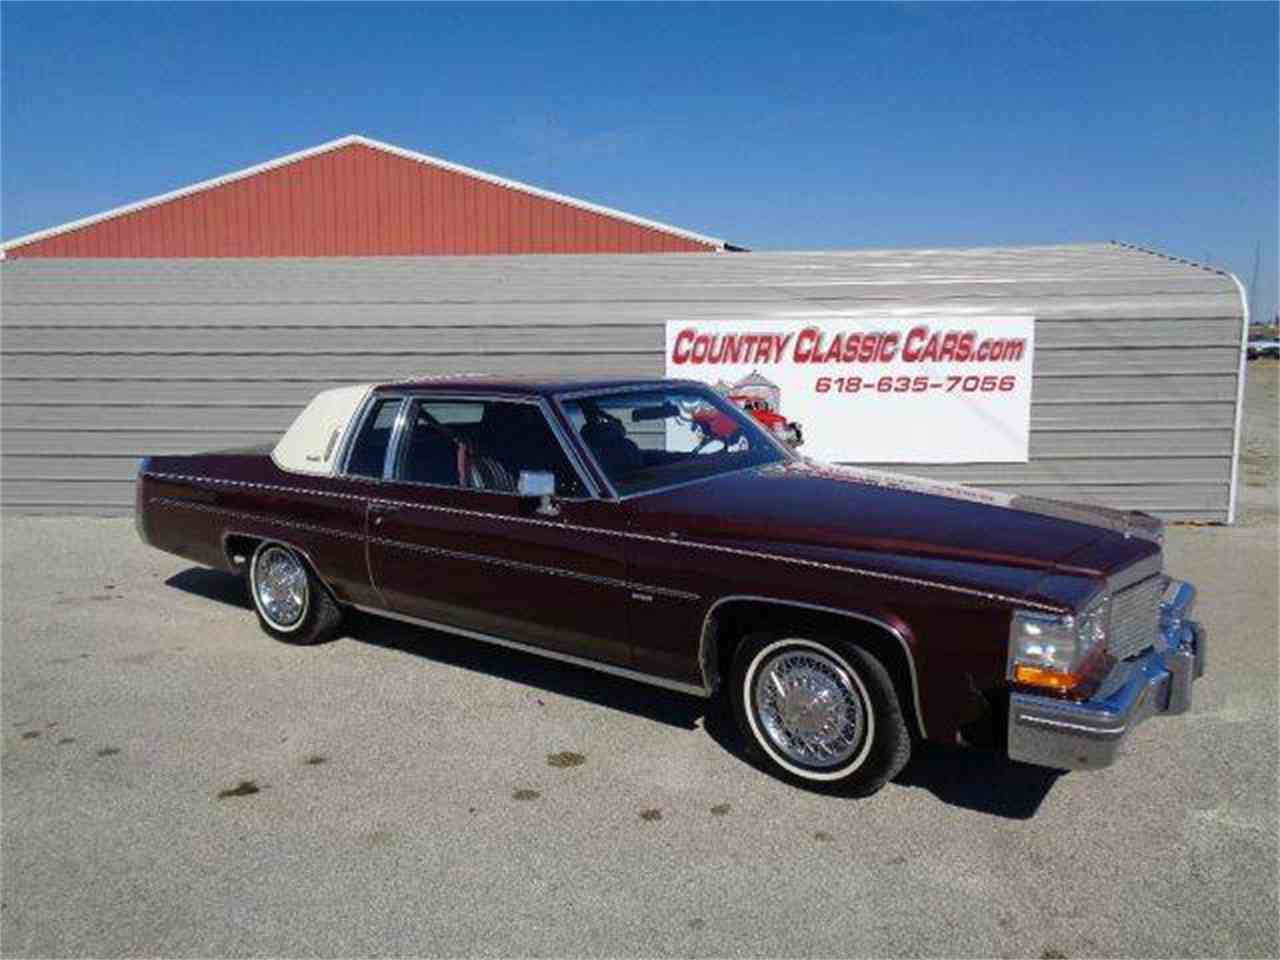 1981 Cadillac Coupe DeVille for Sale | ClassicCars.com | CC-1029128